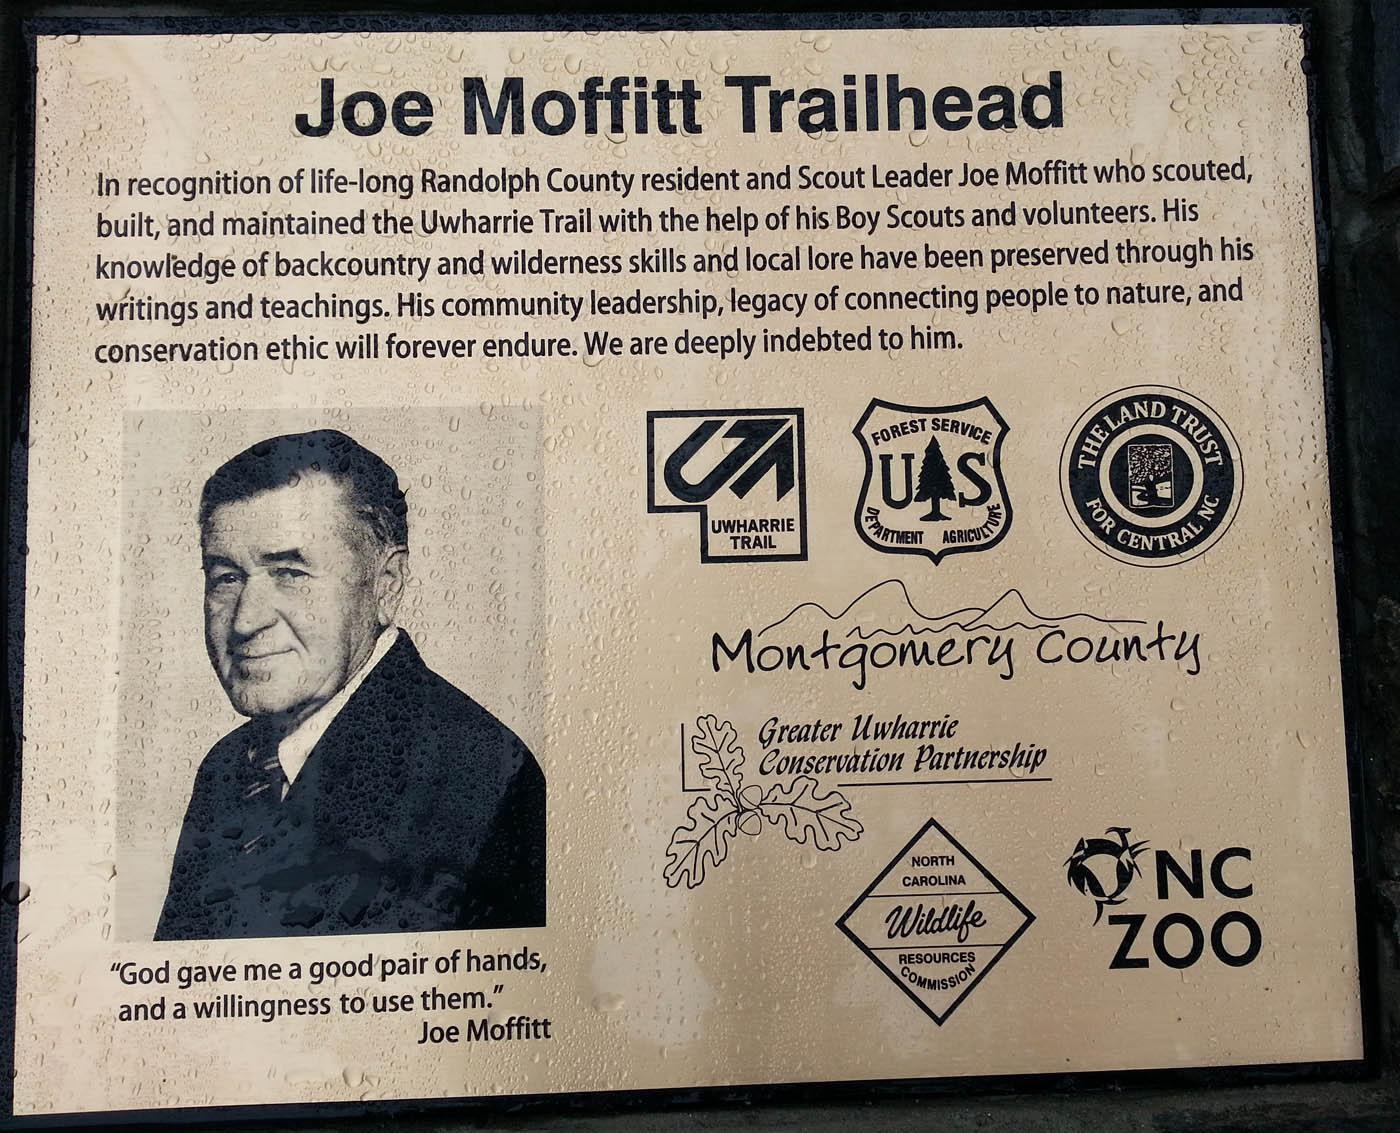 Sign at Joe Moffitt Trailhead on Uwharrie Trail